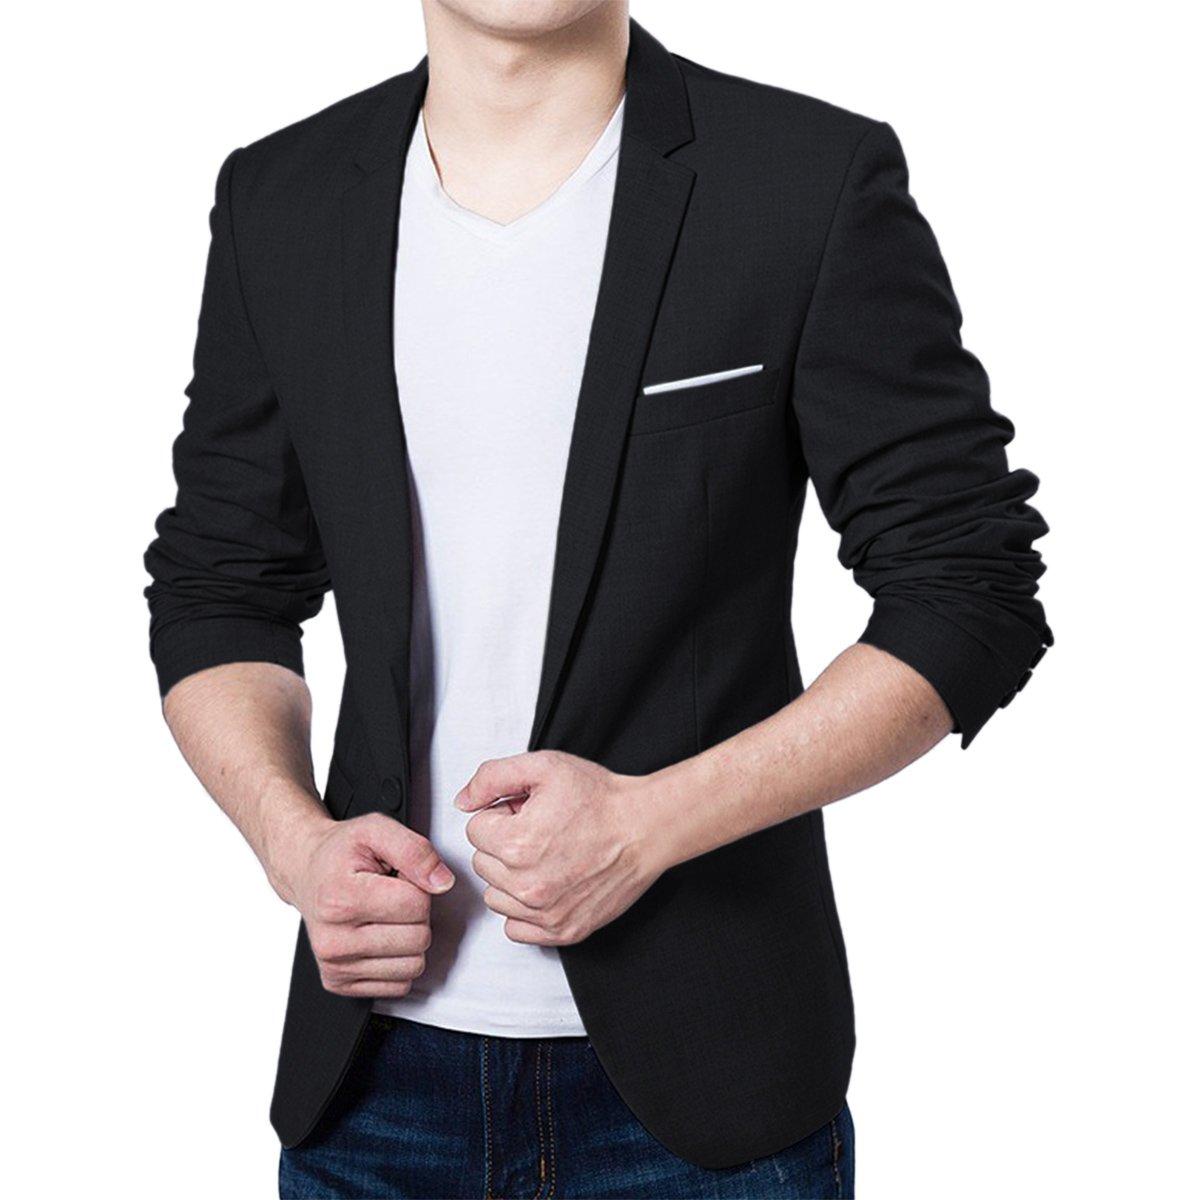 Pishon Men's Blazer Jacket Lightweight Casual Slim Fit One Button Sport Jackets, Black, Tag Size XXXXL=US Size L